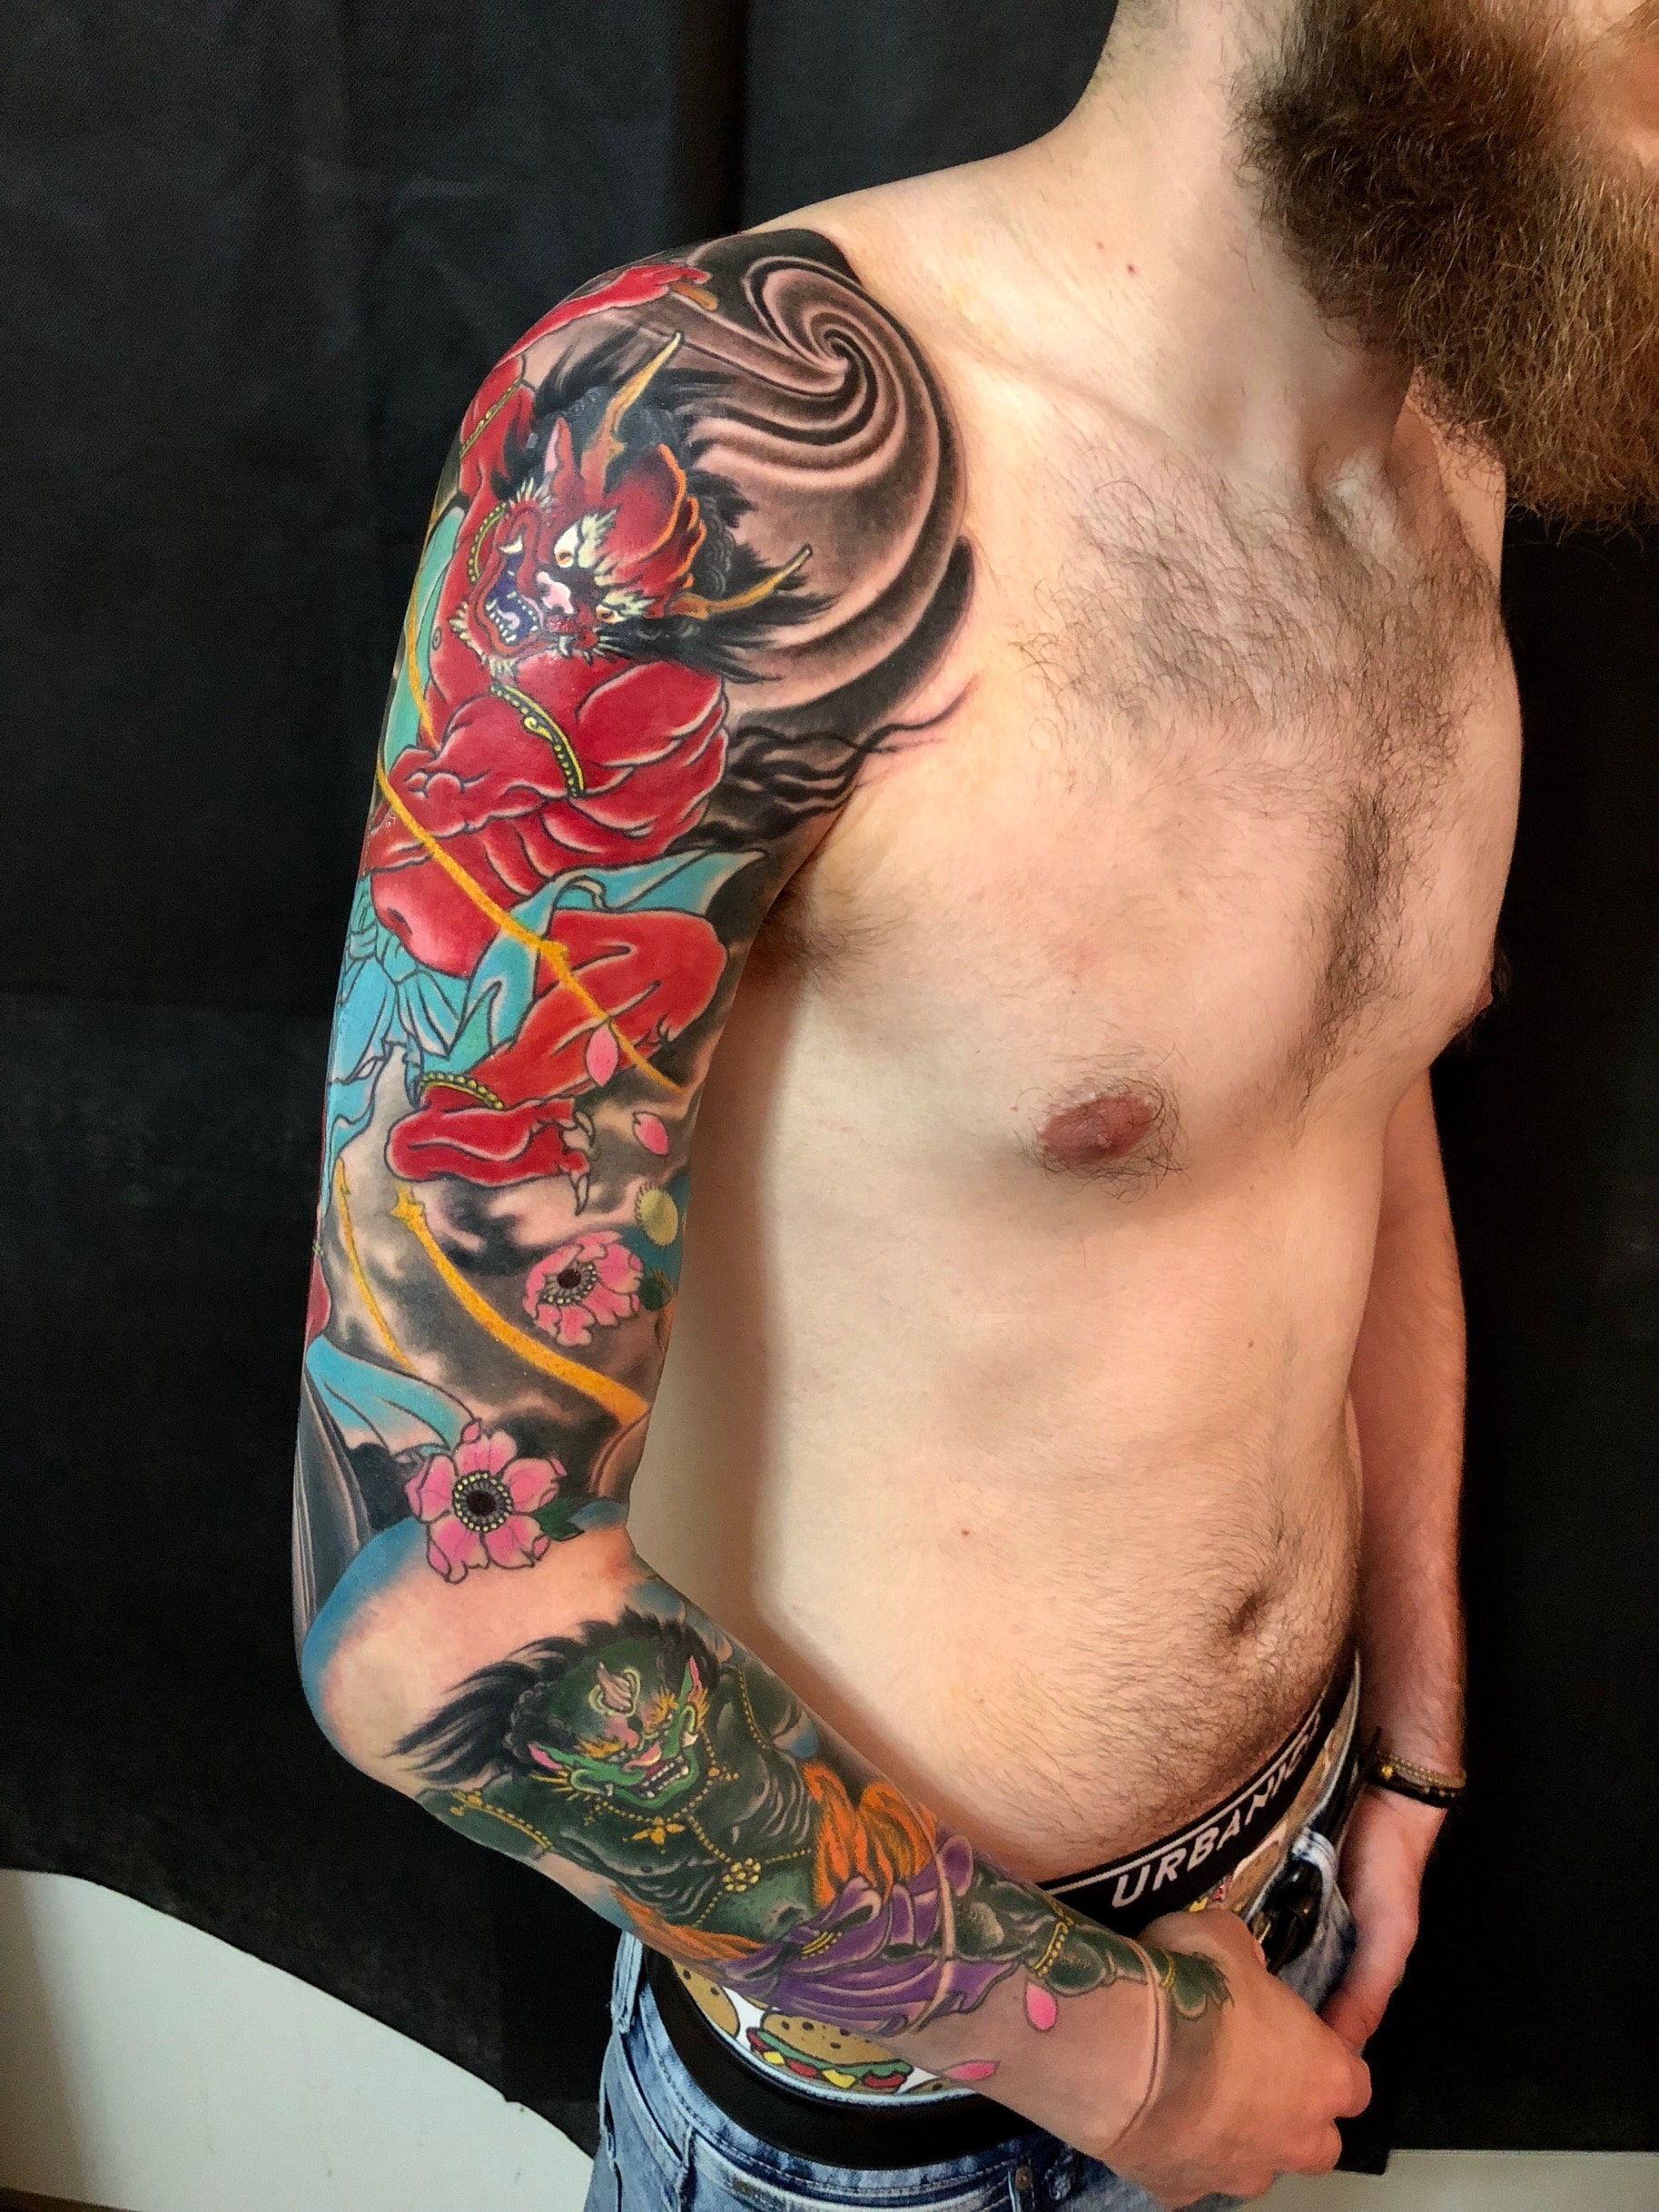 Joe Ankave Tattoo Artist Interview Image 2